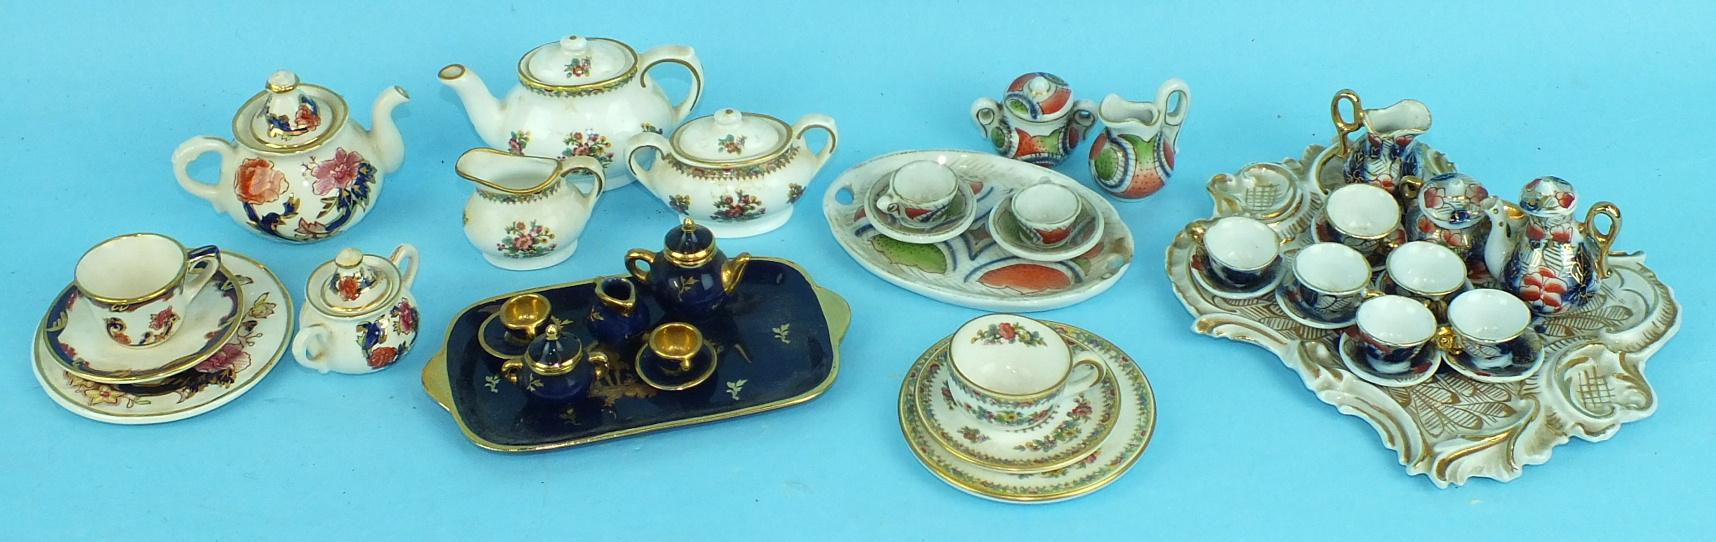 A Coalport 'Ming Rose' decorated miniature tea set for one, a similar Mason's Mandalay tea set, (